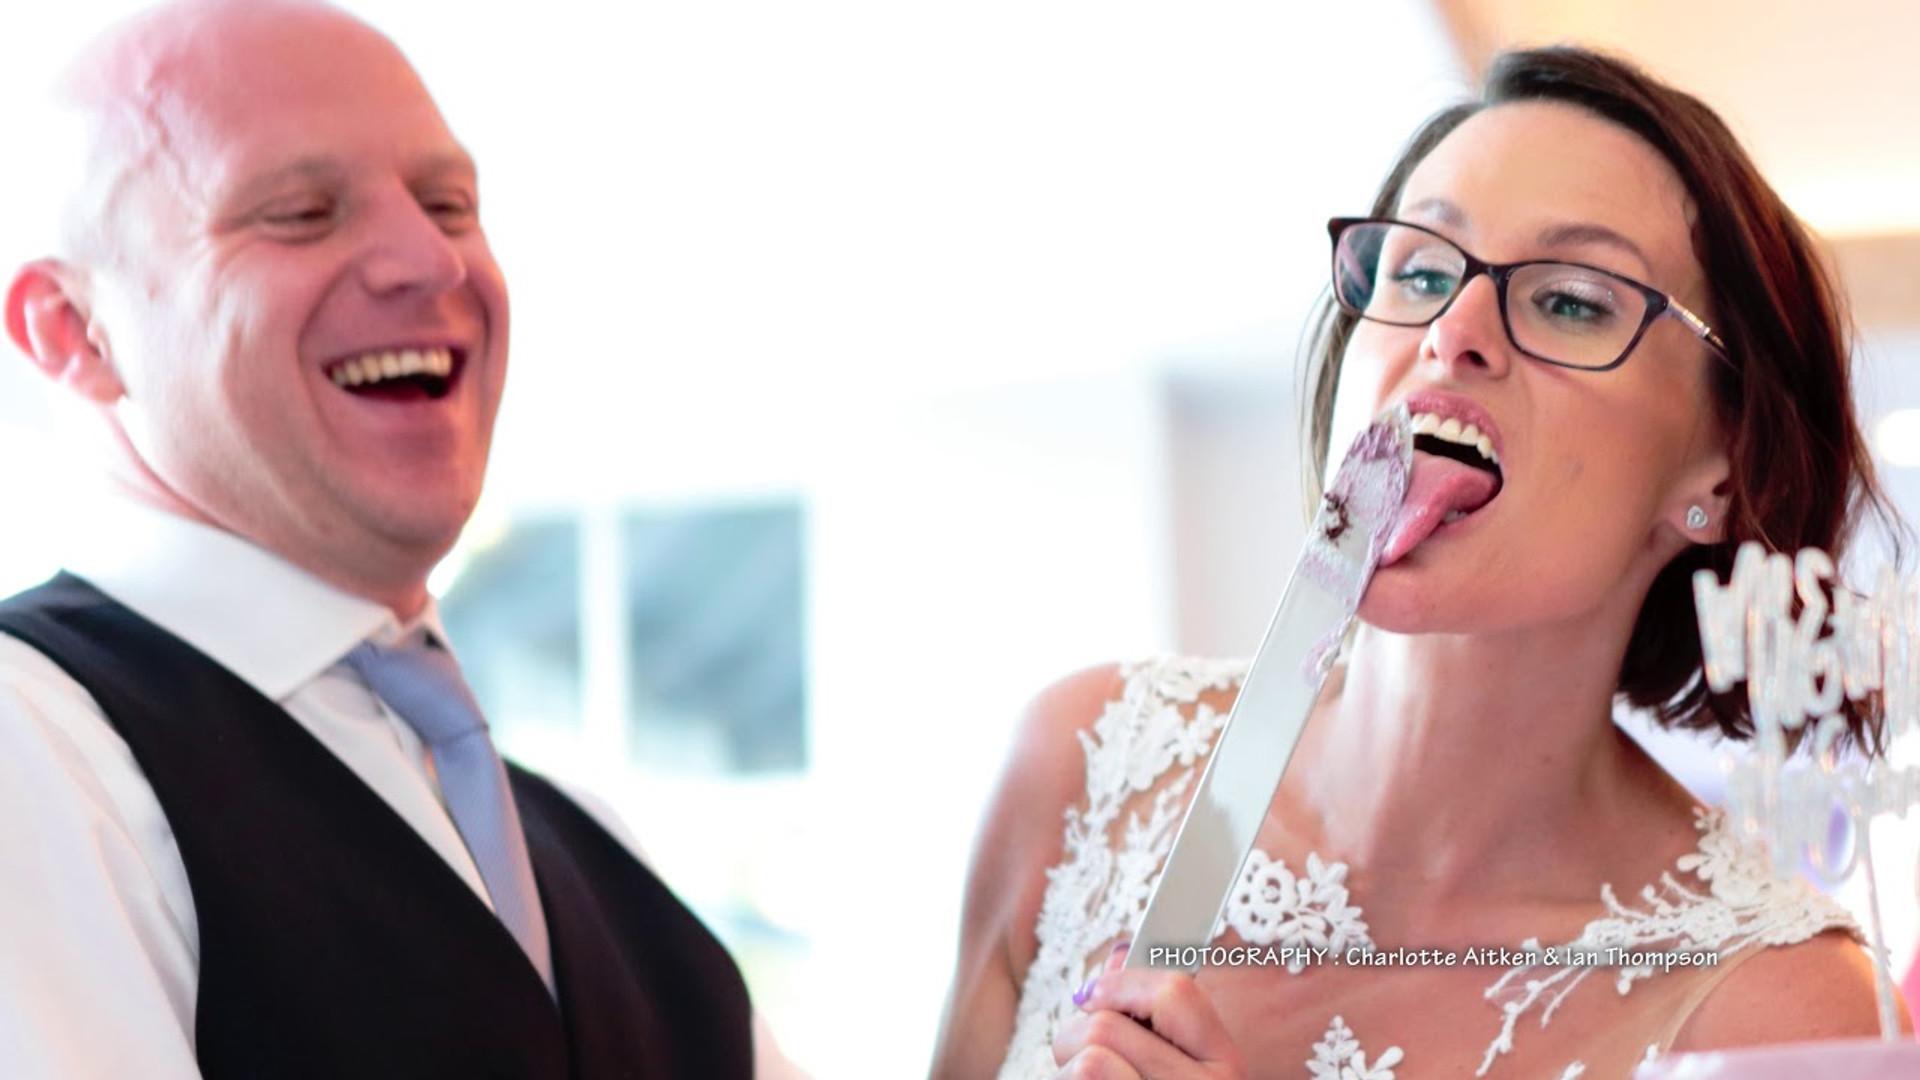 The Wedding of Kate & Tom